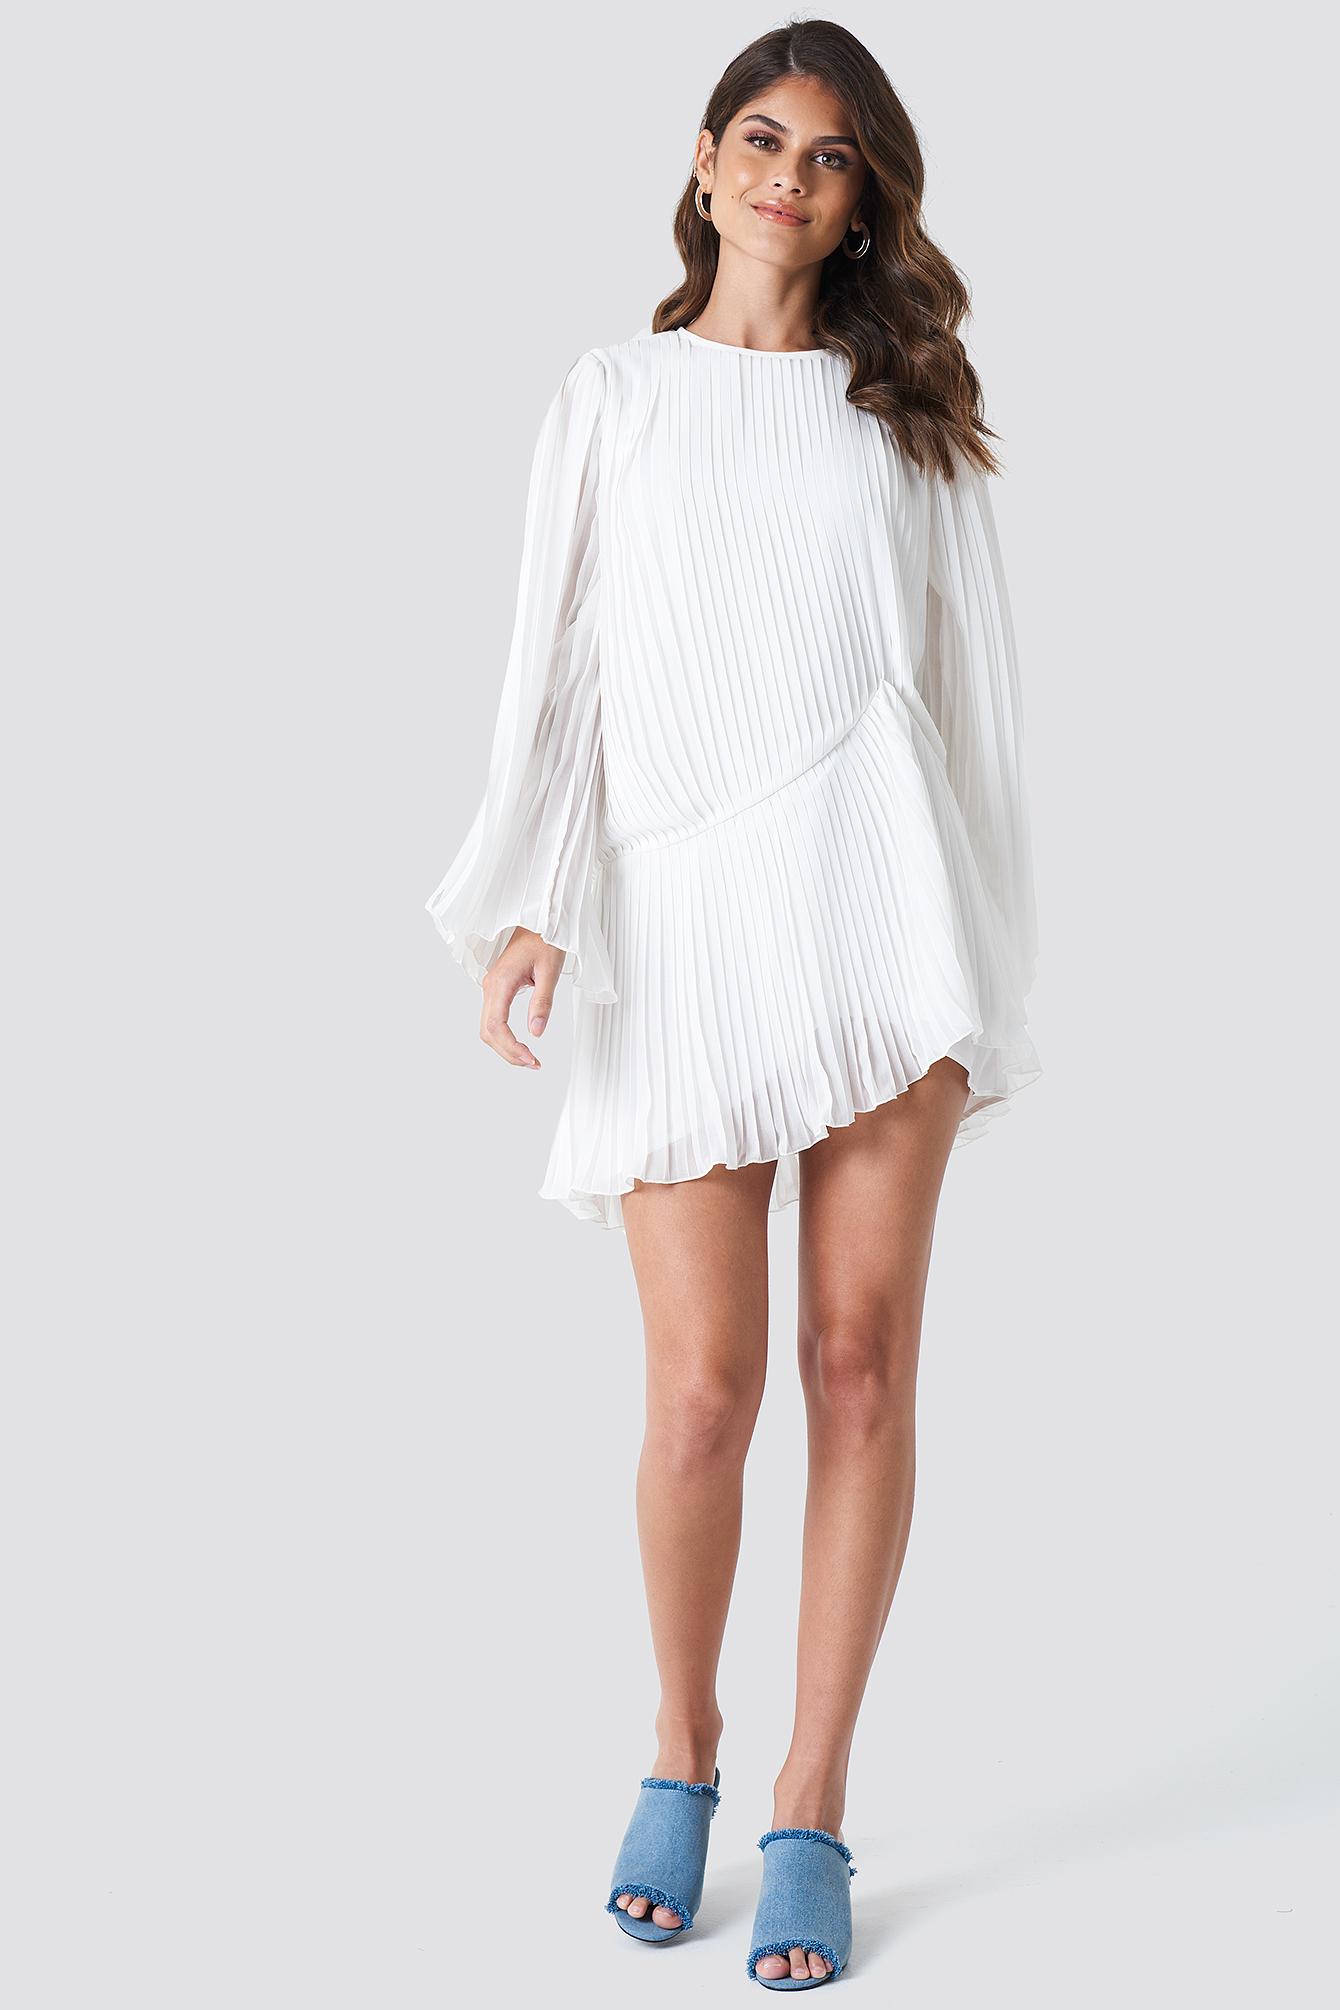 Party Dresses | Women\'s Lace, Sequin & Bodycon | na-kd.com